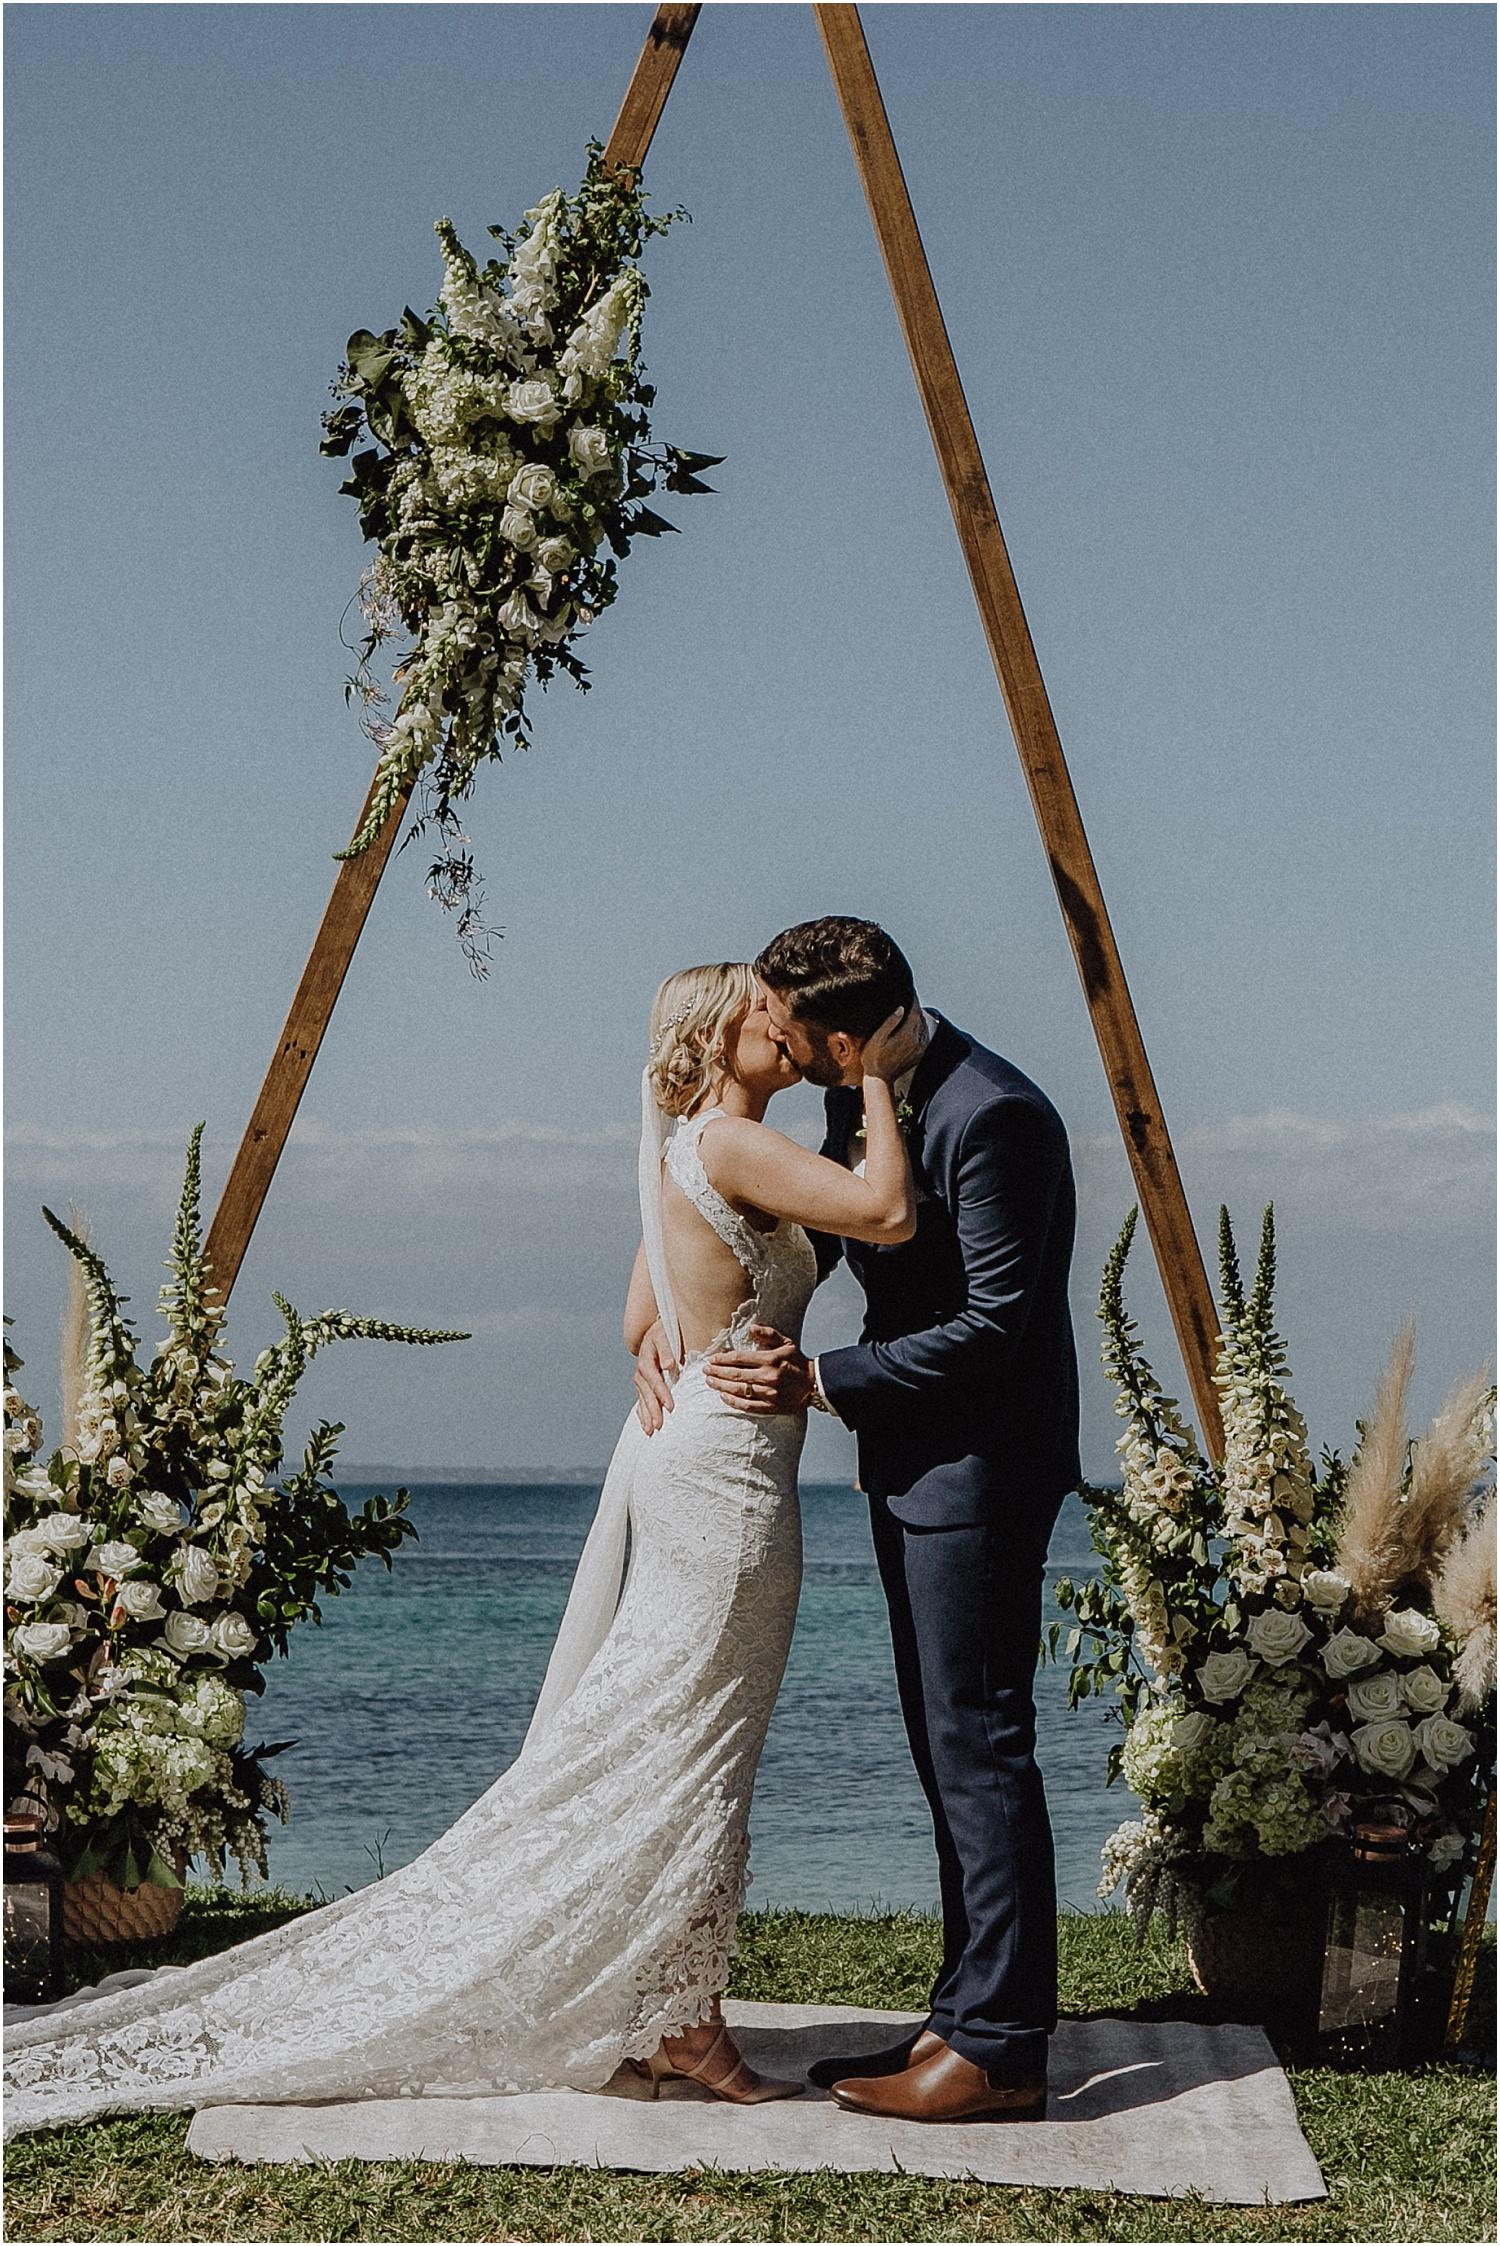 Nicolle and Damien's tipi wedding at the Flinders Yacht Club on the Mornington Peninsula._0082.jpg